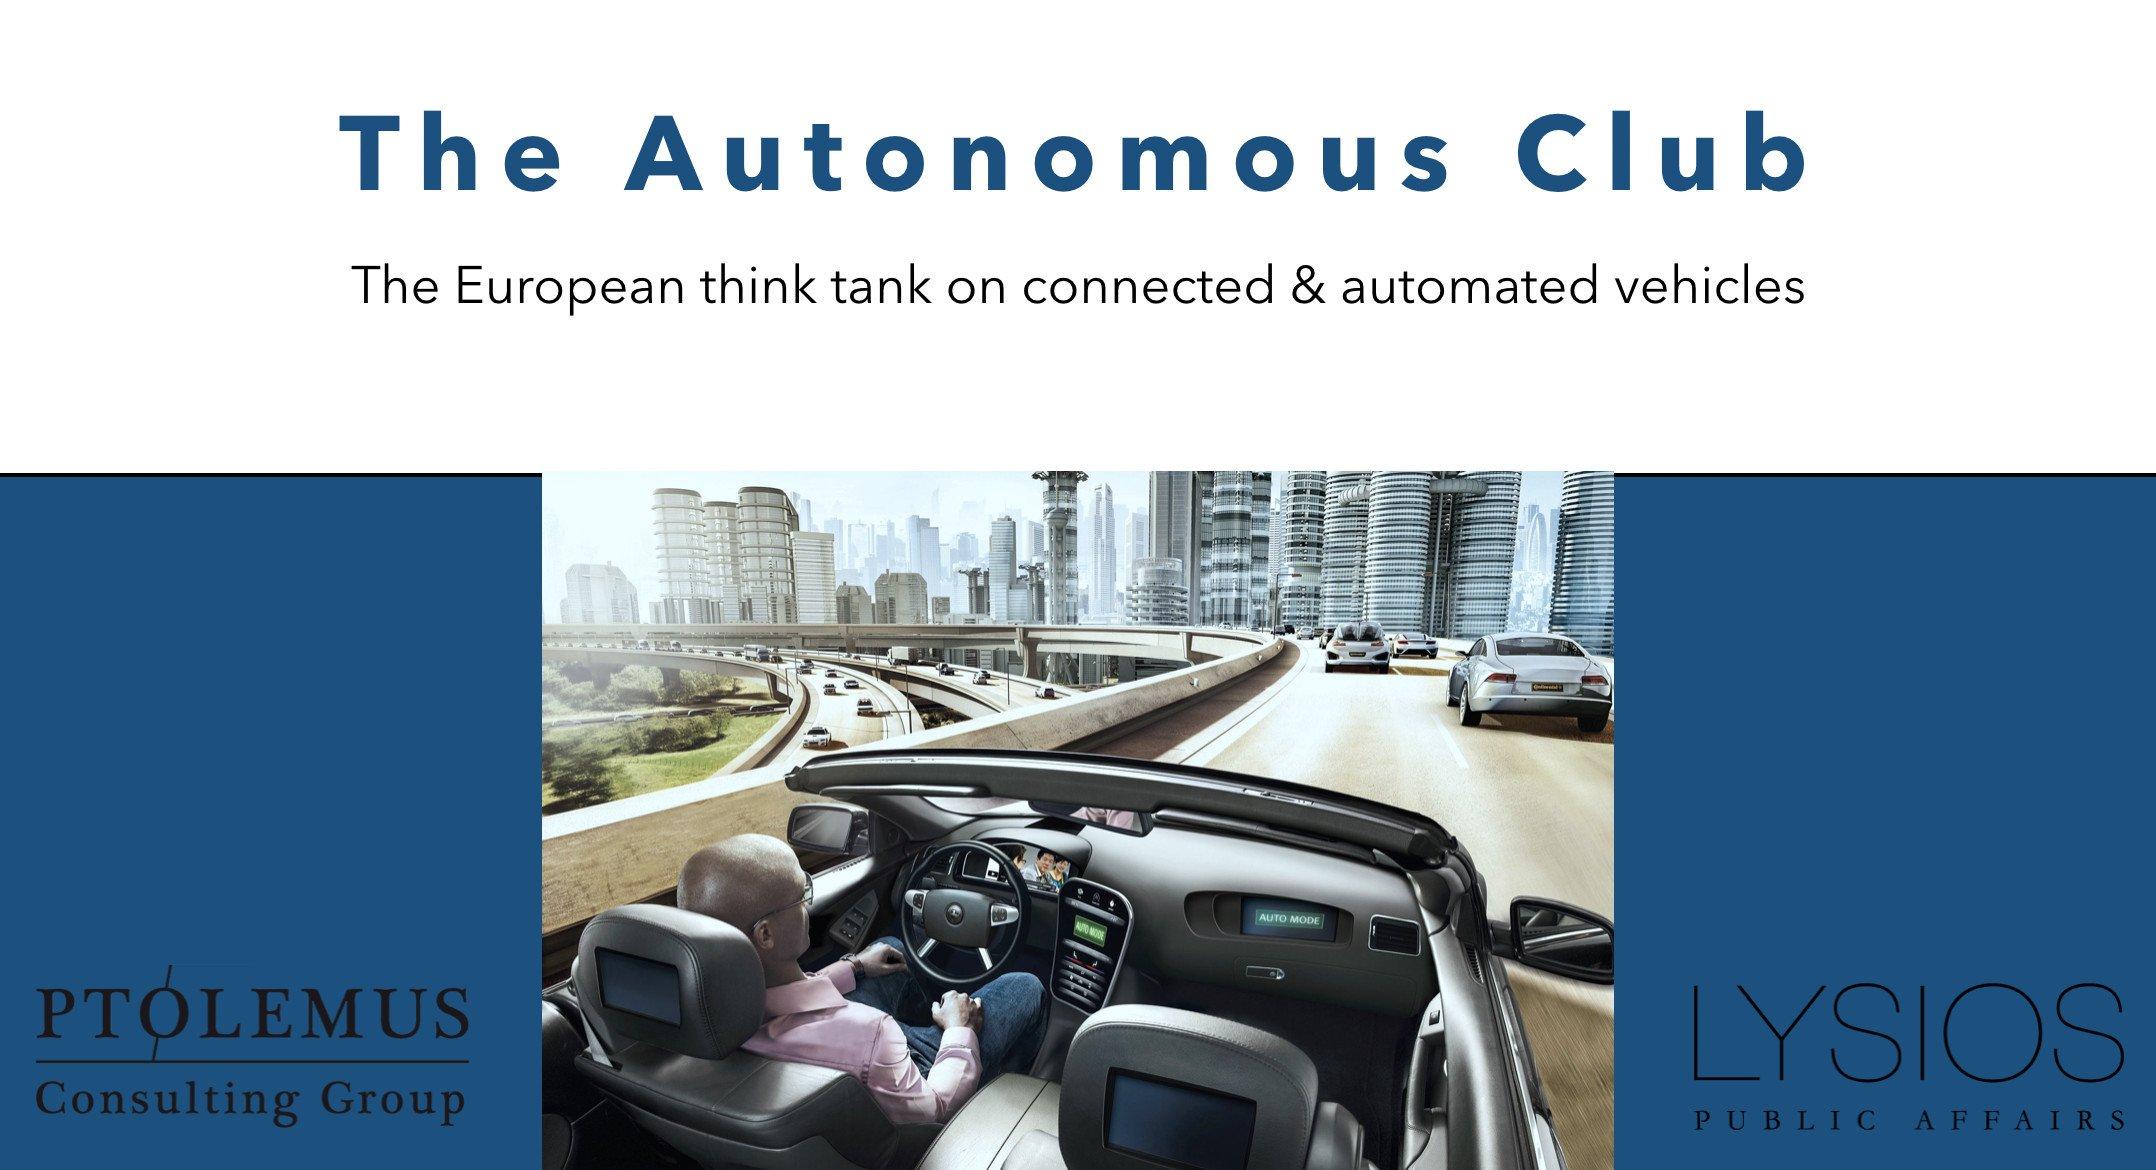 The Autonomous Club | Ptolemus